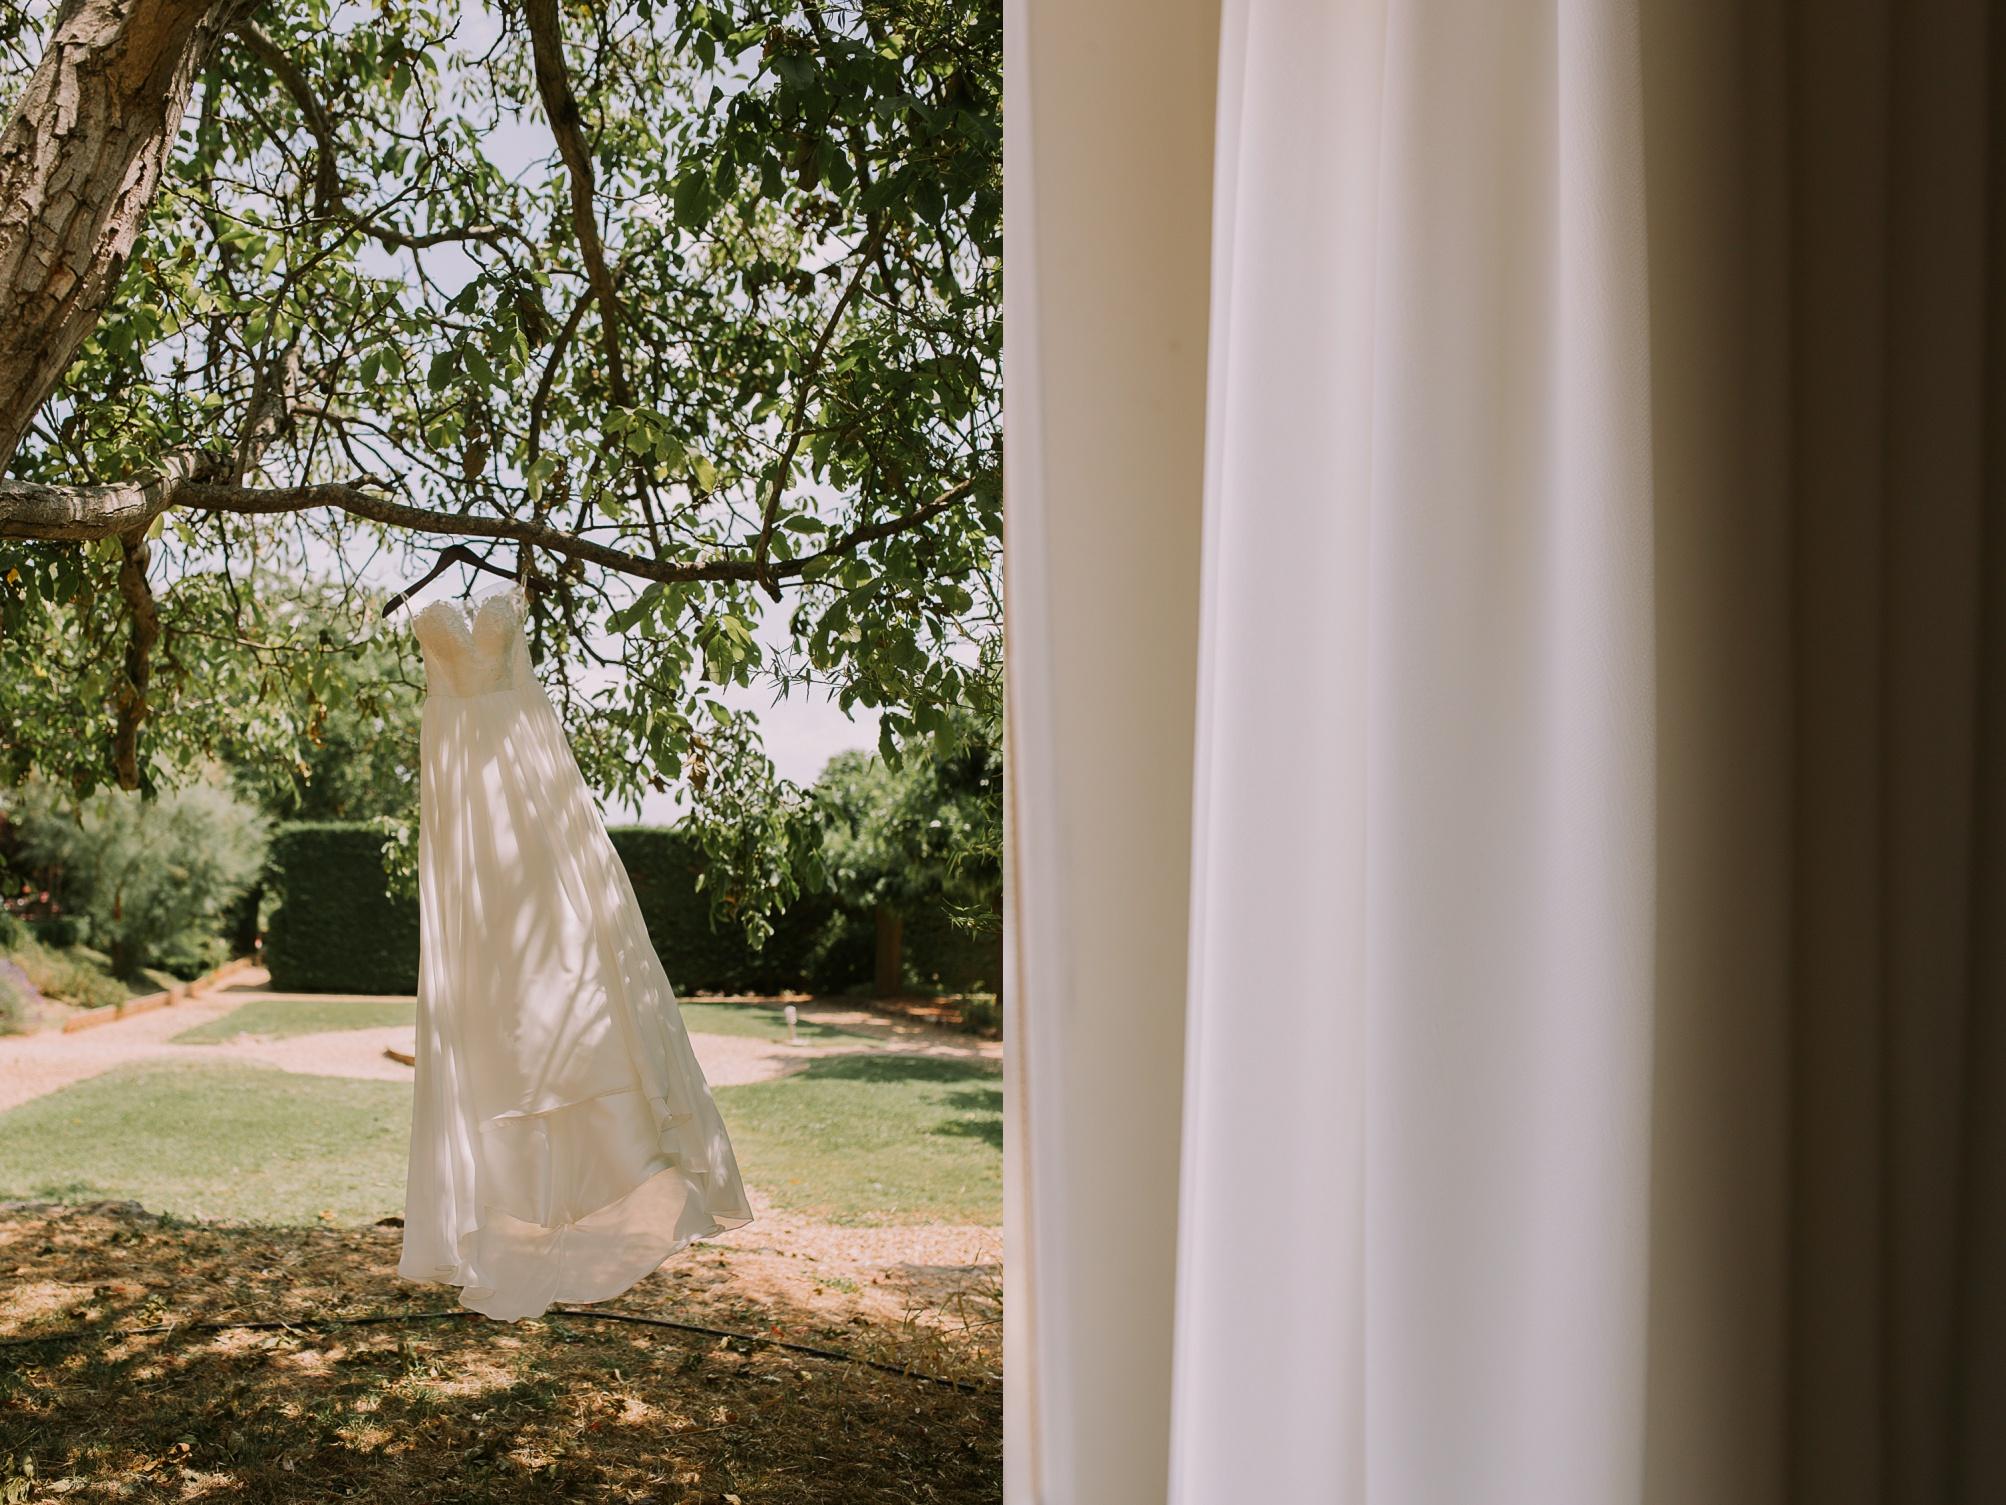 katerynaphotos-mariage-photographe-puyloubier-provence-aix-en-provence-sud-de-la-france_0328.jpg